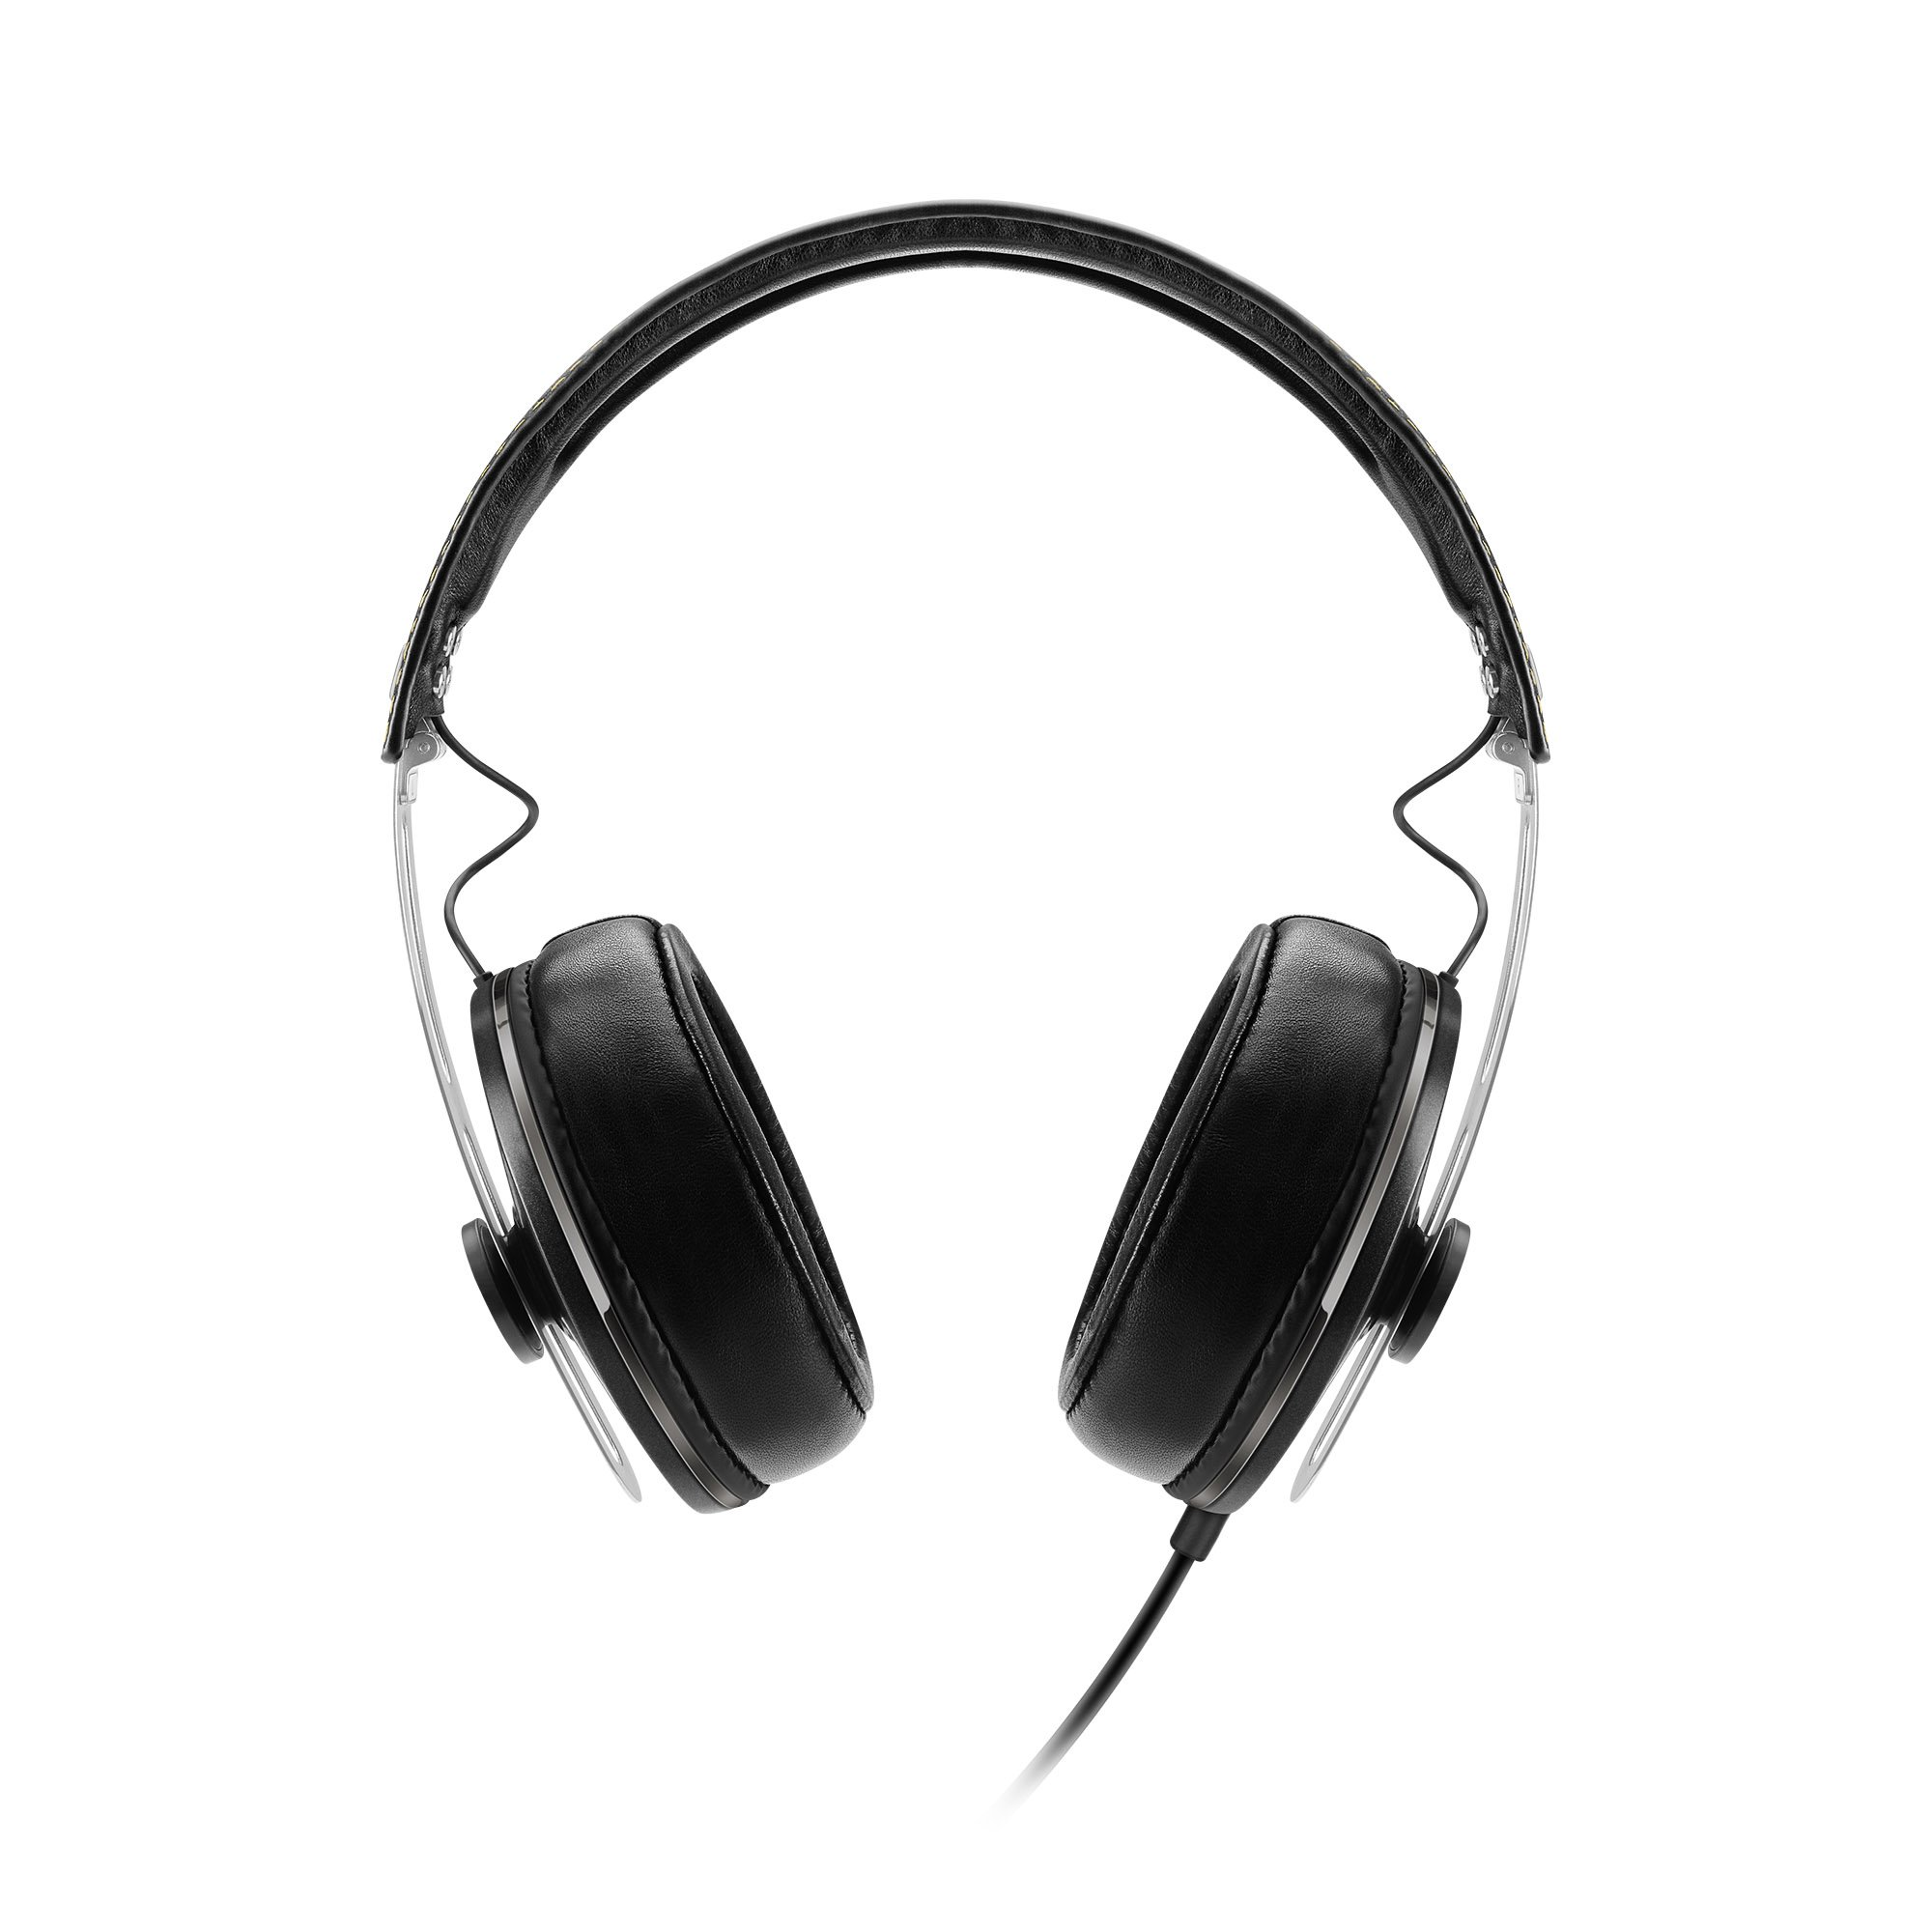 Auriculares Sennheiser Momentum 2.0 para Apple Devices - Negro